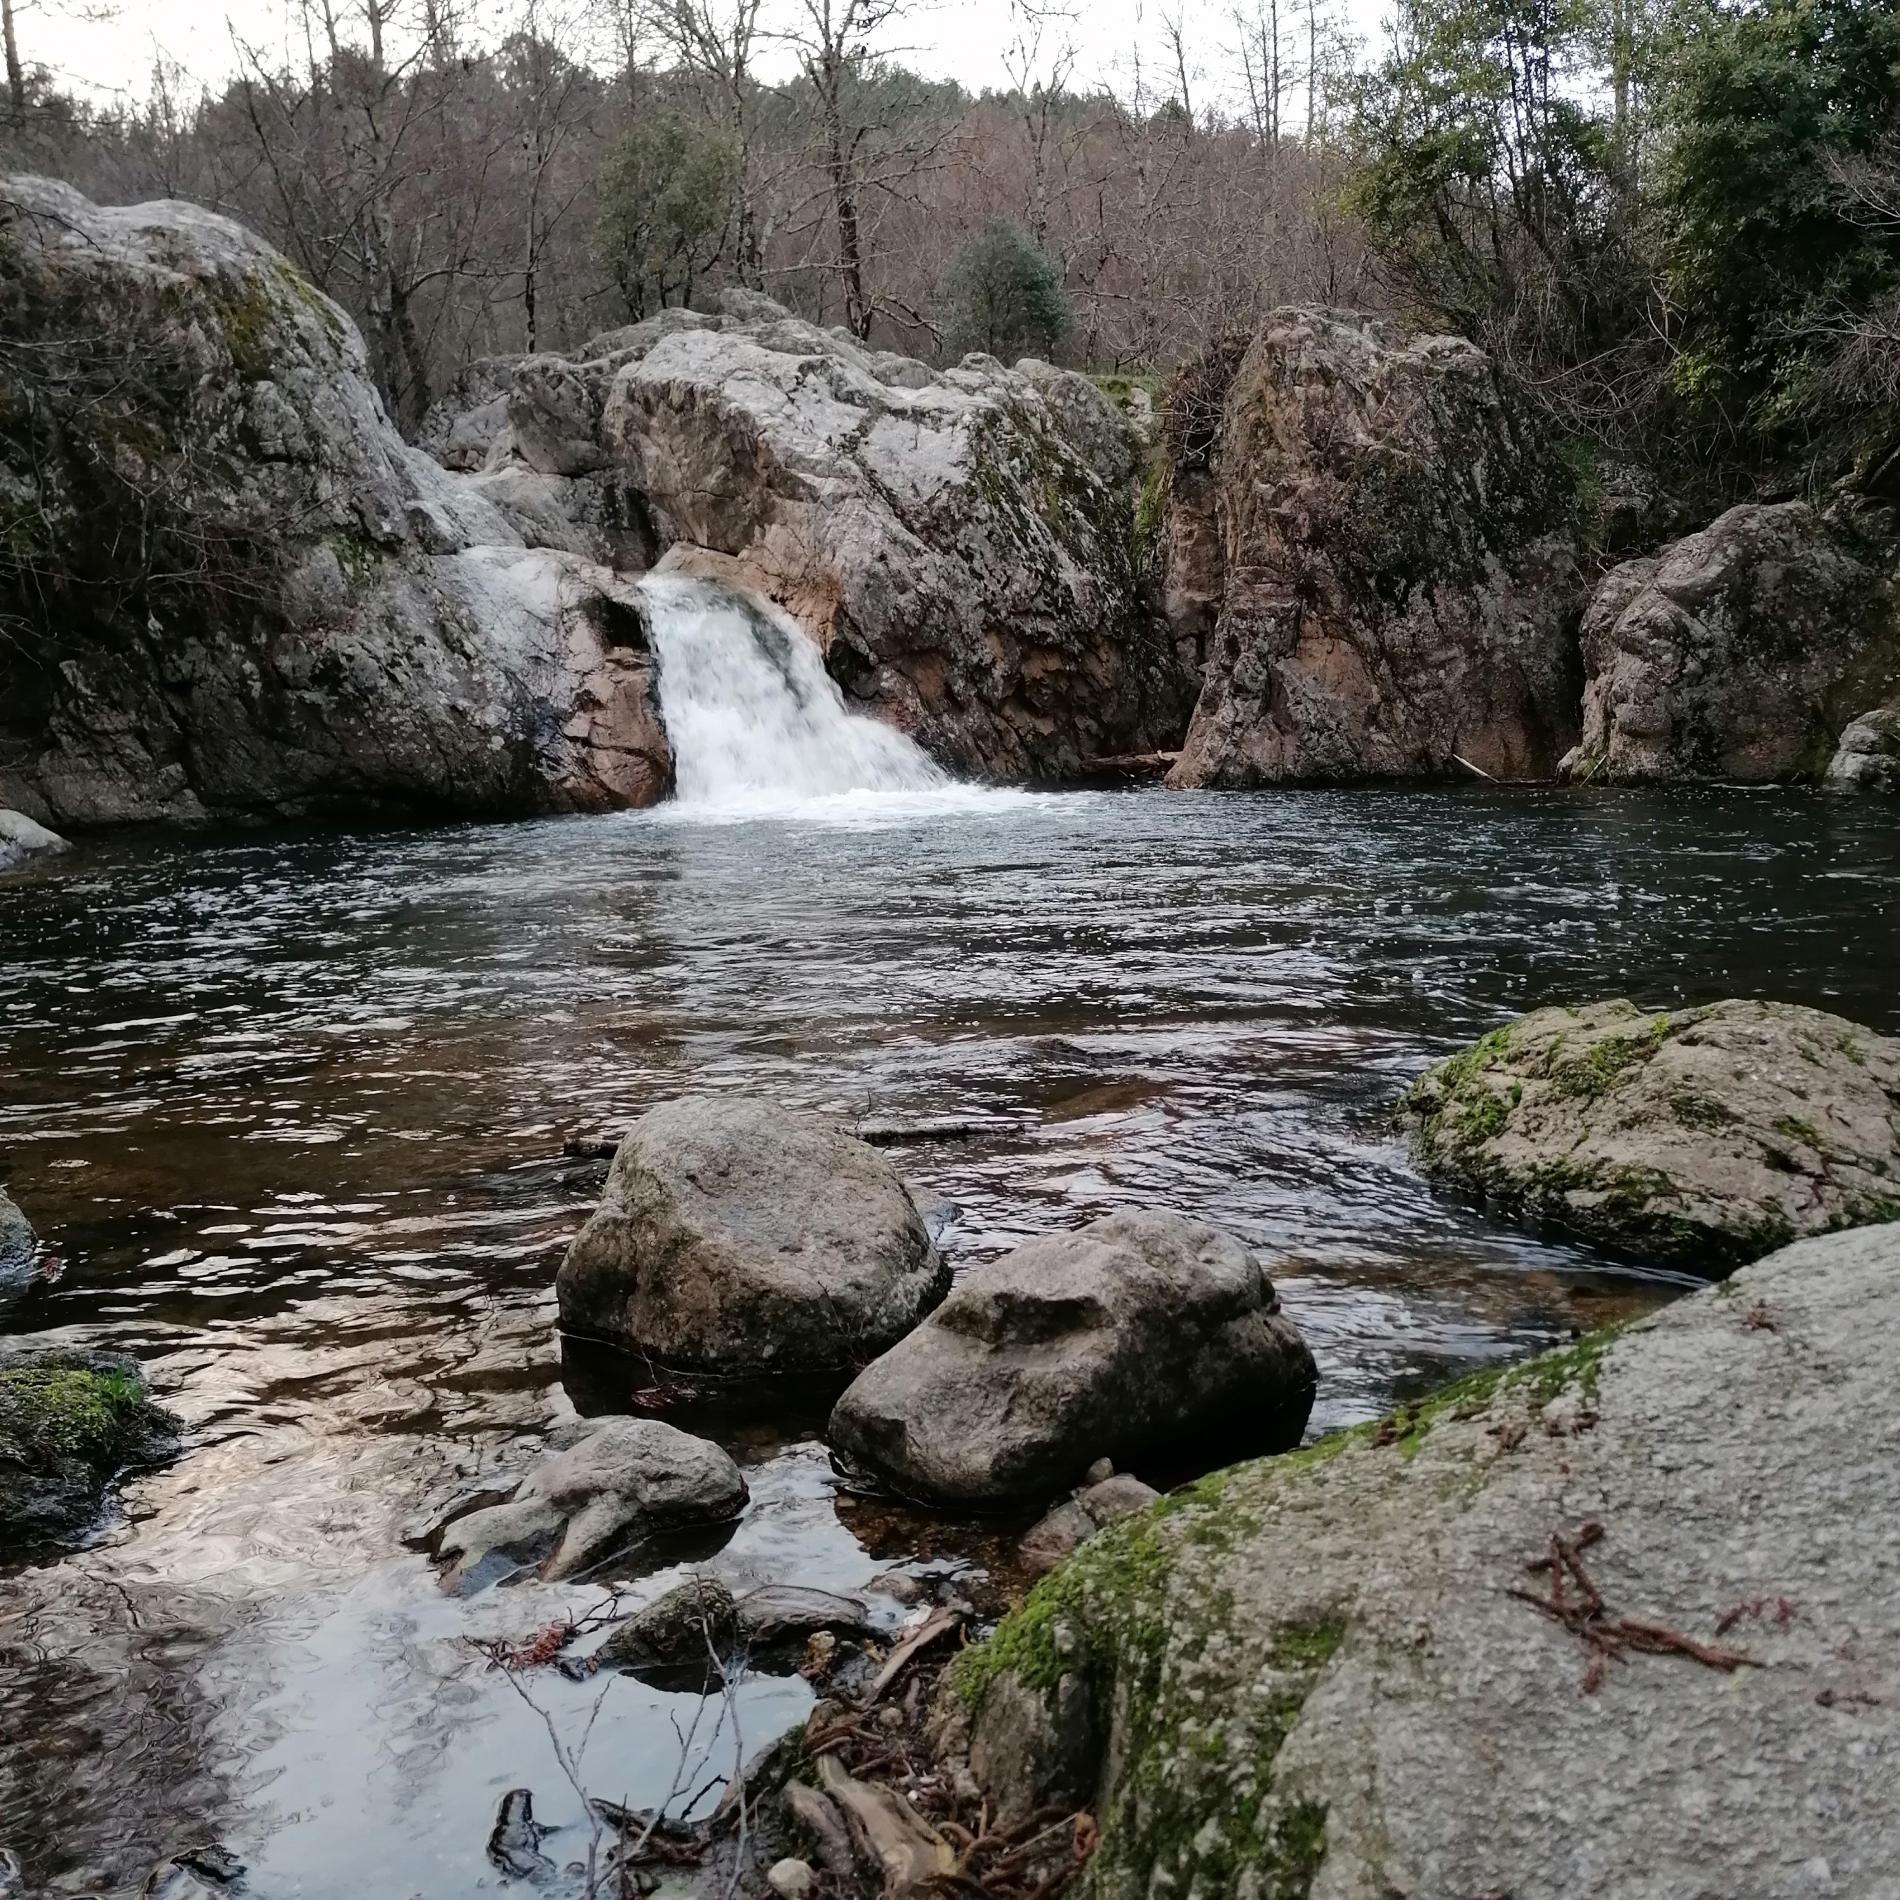 Baignades en Ardèche